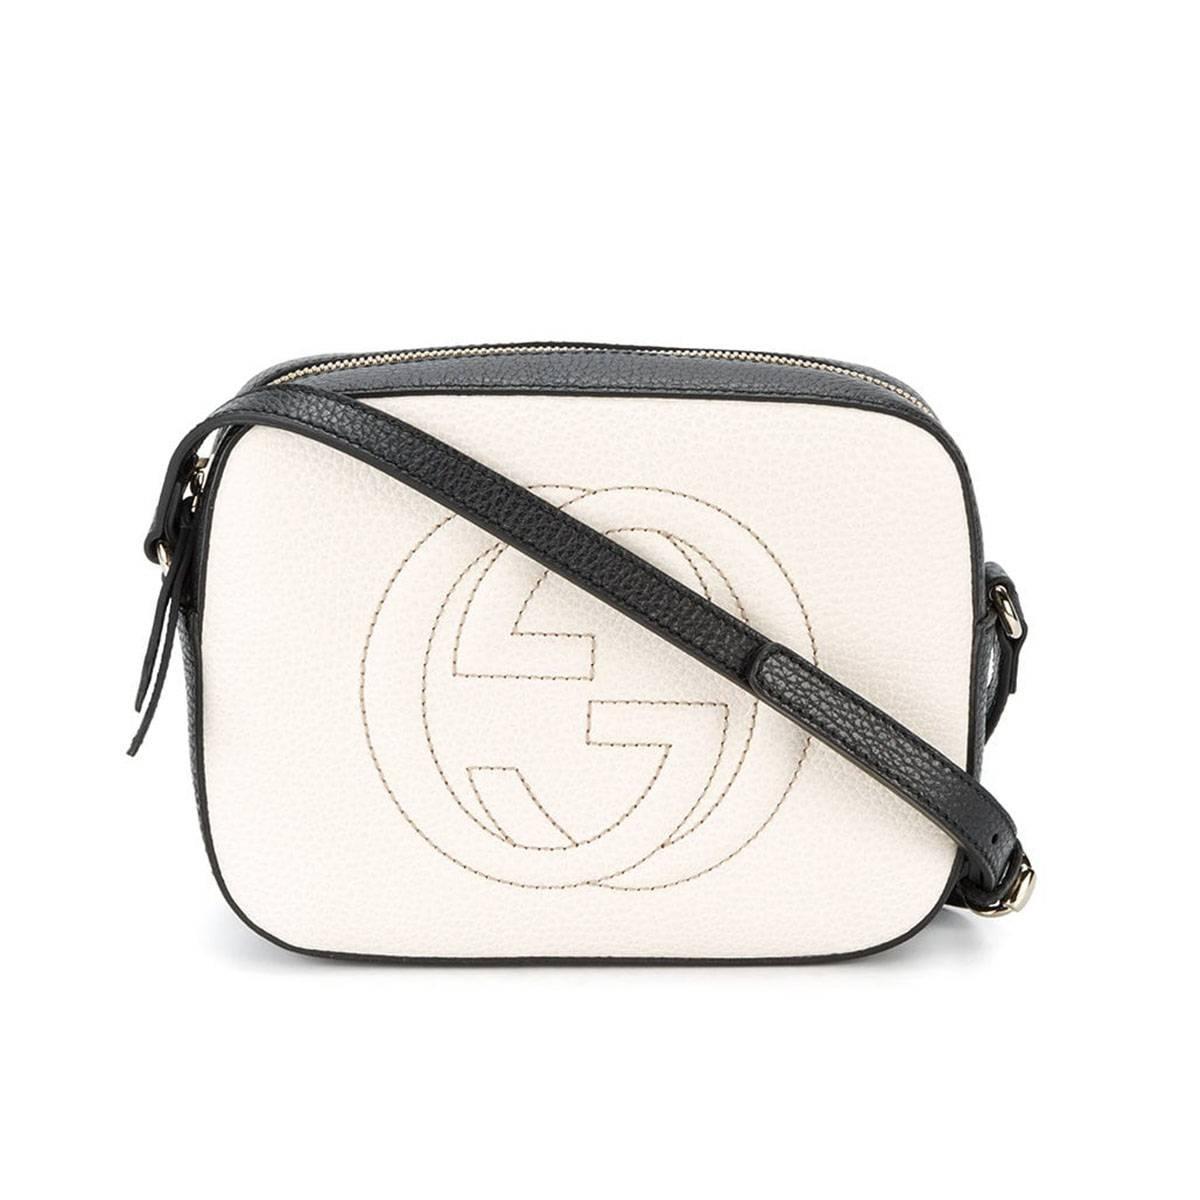 Gucci Soho Disco Textured-Leather Shoulder Bag